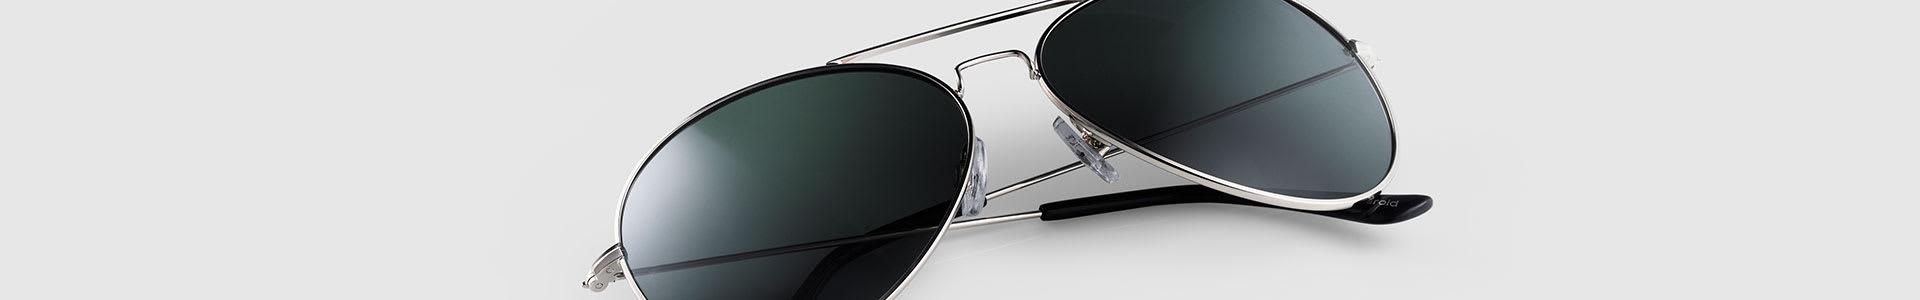 Prescription Aviator Sunglasses